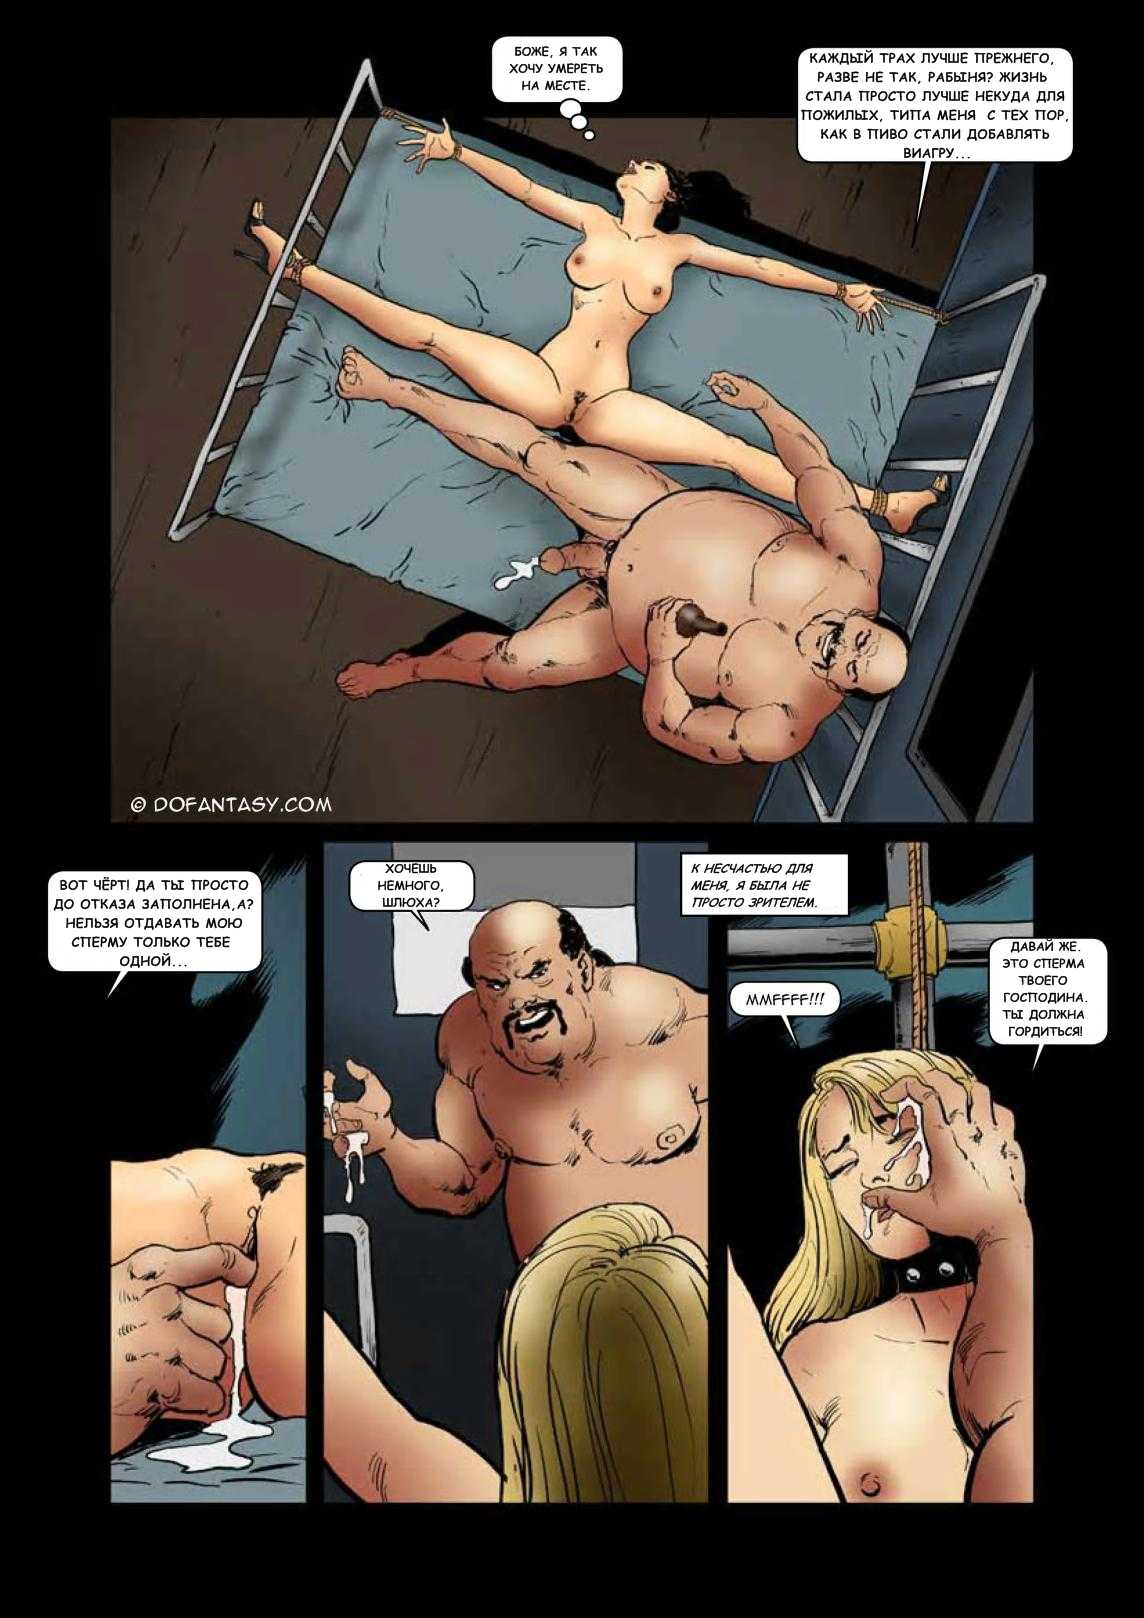 izvrashennie-porno-istorii